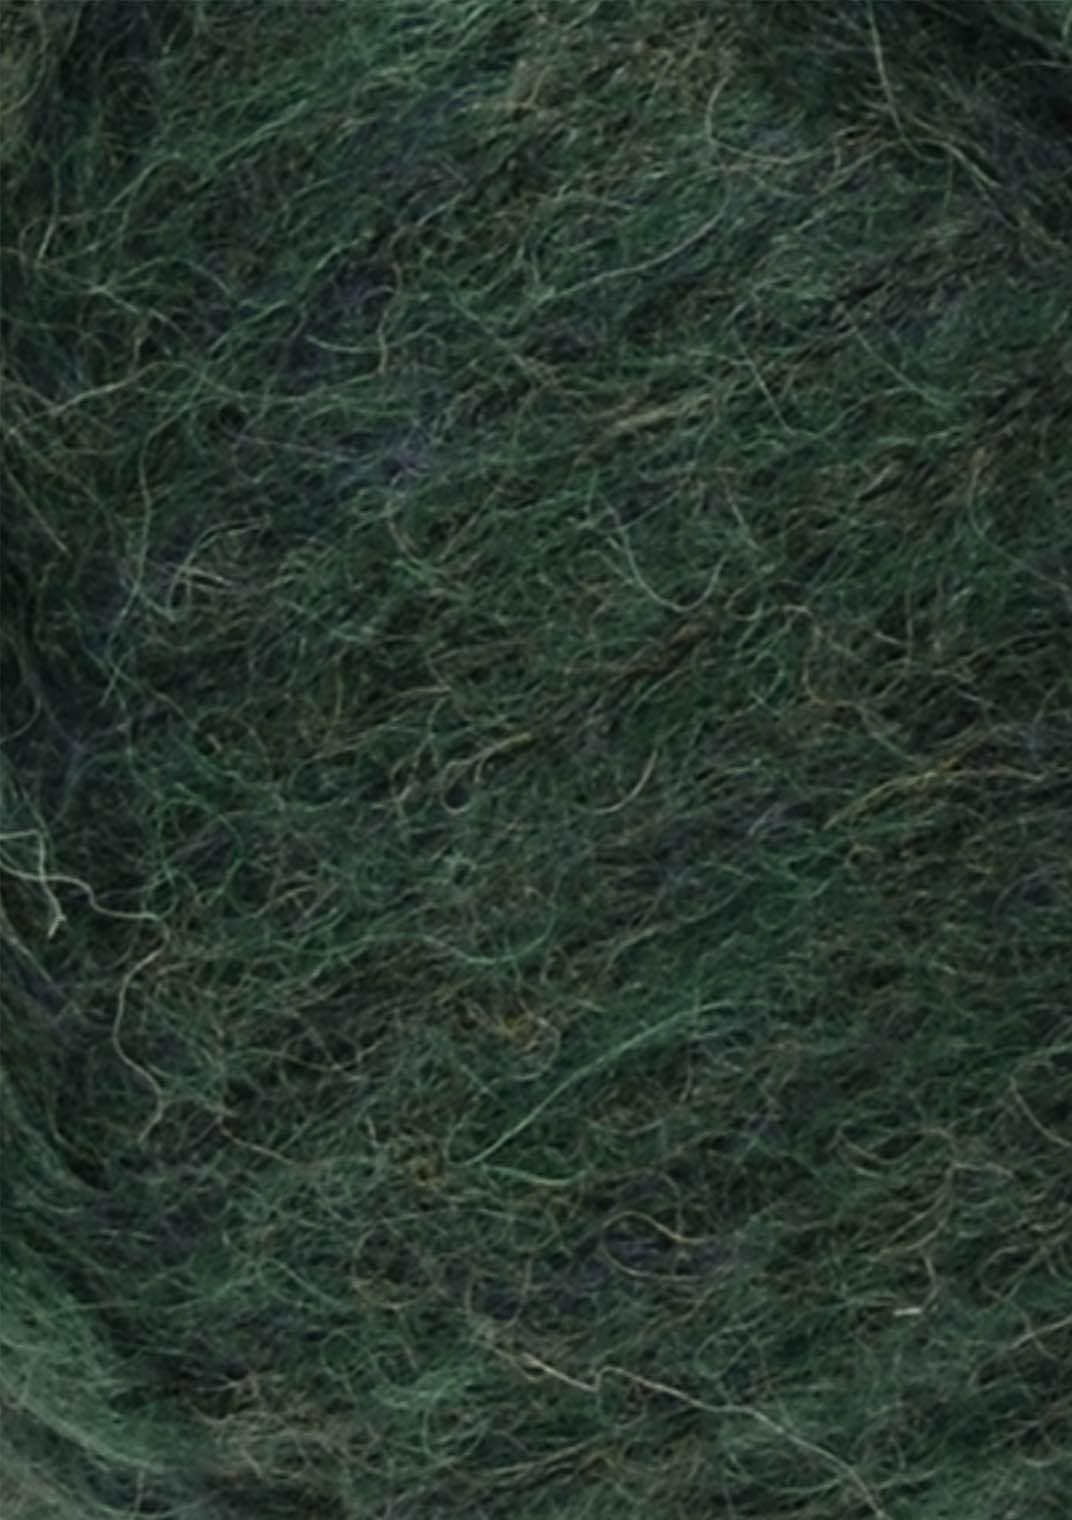 7270 Grønmeleret KOS Sandnes garn